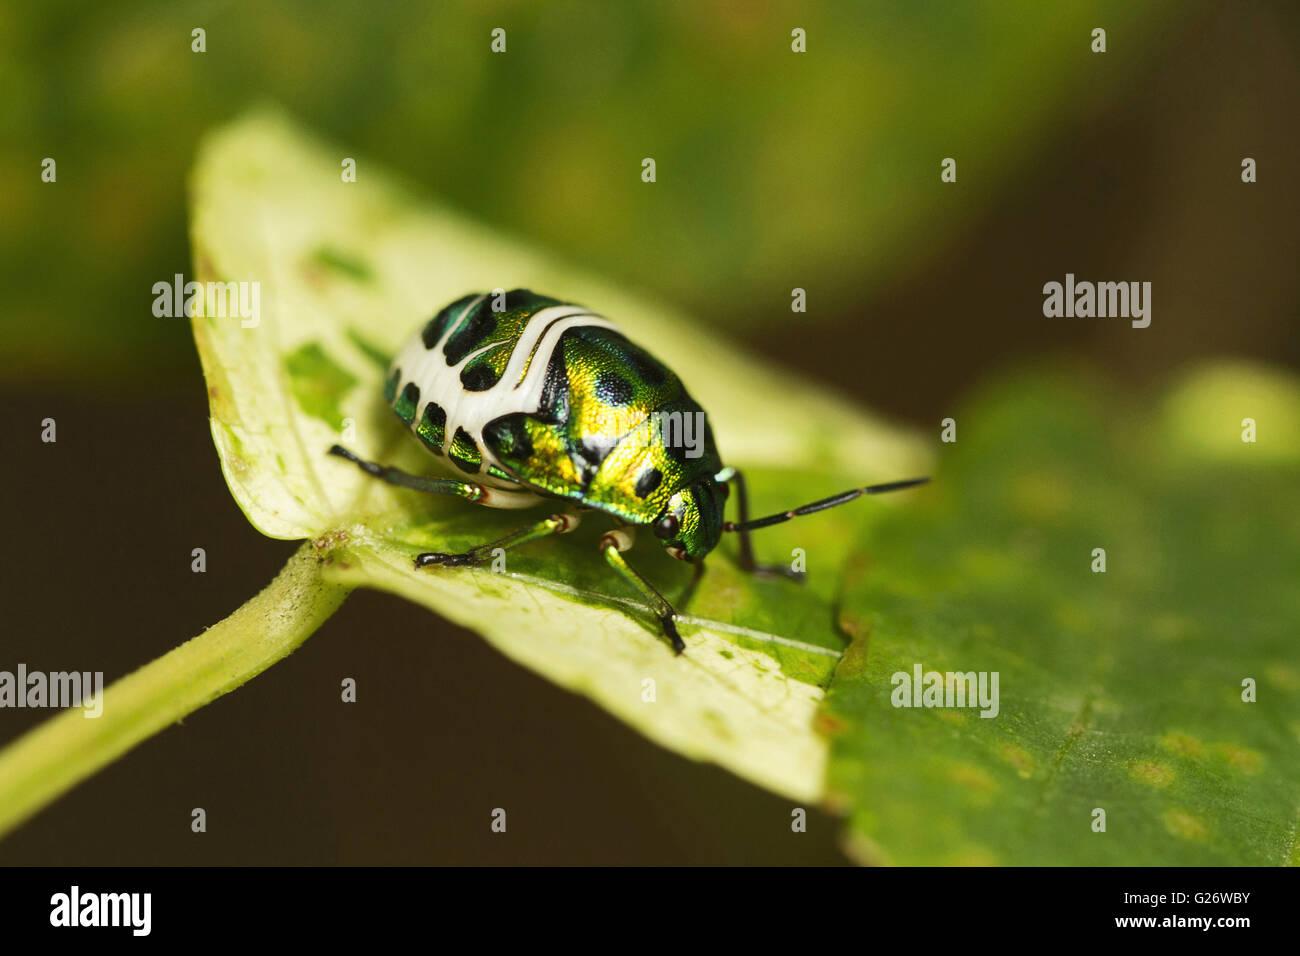 Jewel Bug or Shield Backed Bug in the family Scutelleridae. Chrysocoris stolli. Chorla Ghats Mhadei Wildlife Sanctuary - Stock Image